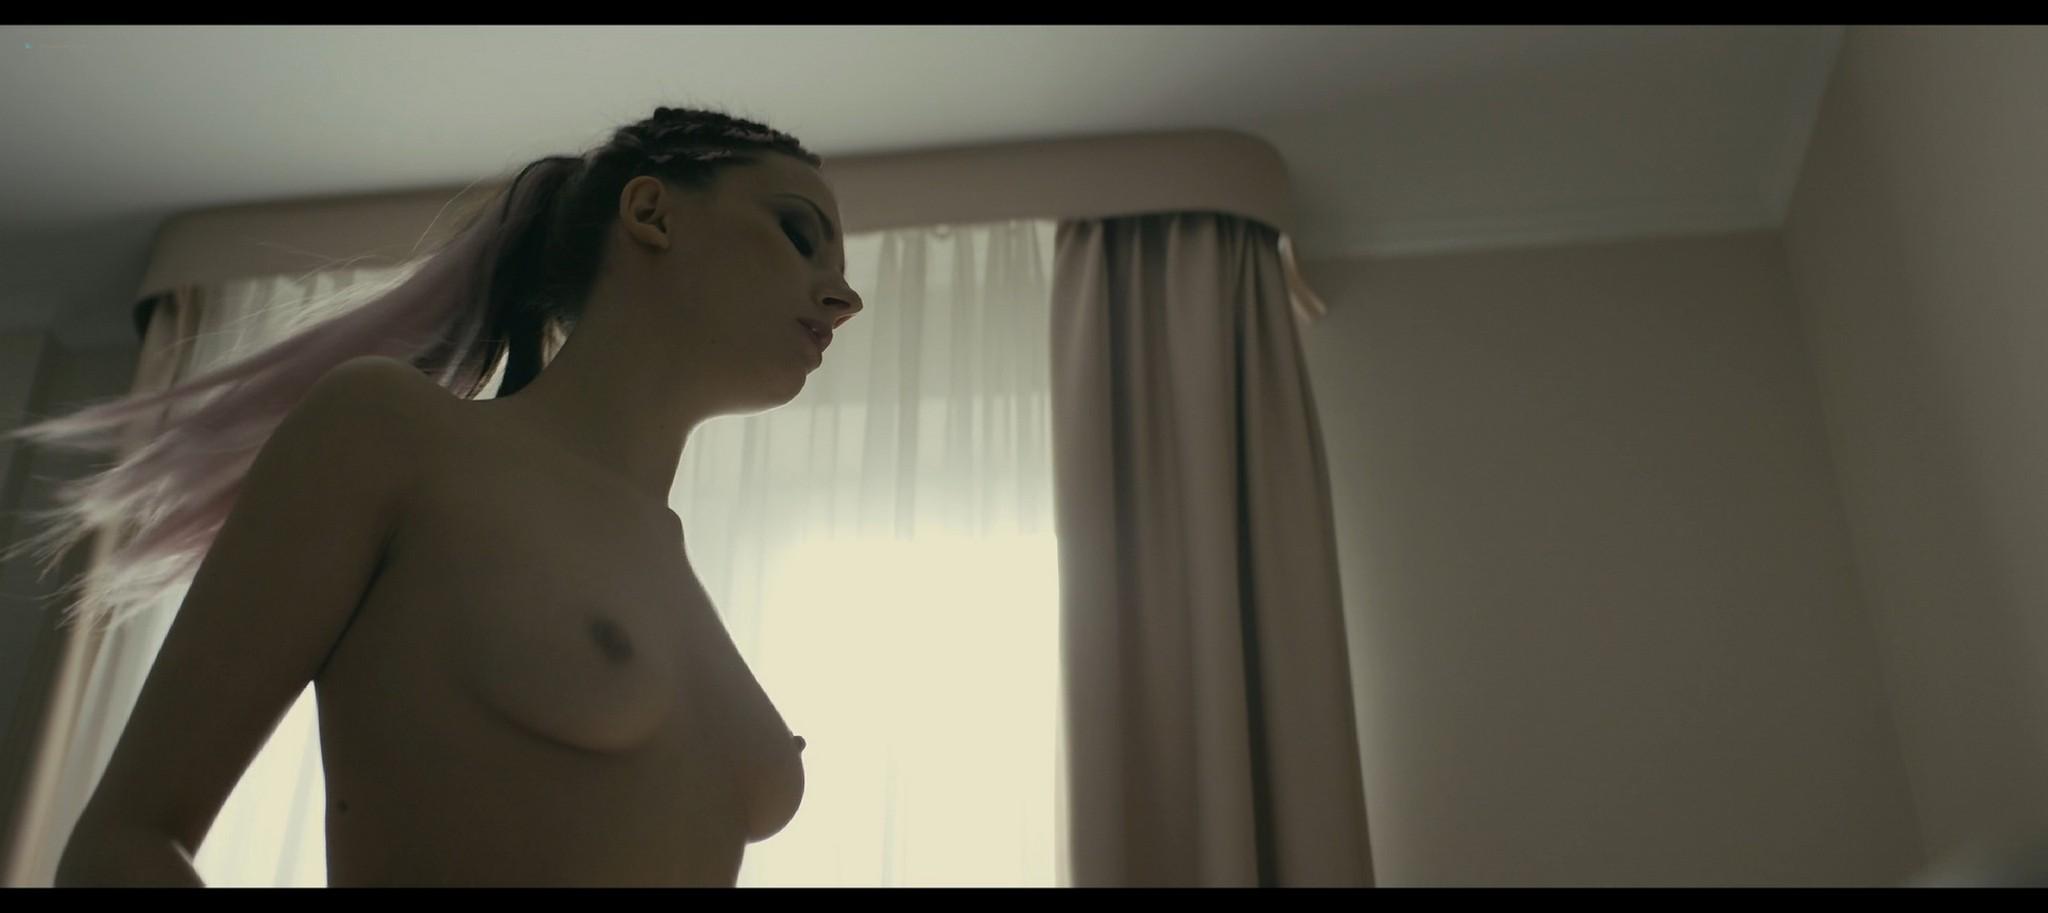 Katarzyna Warnke sex Aleksandra Nowicka Karolina Dziuba nude Petla PL 2020 1080 BluRay 01